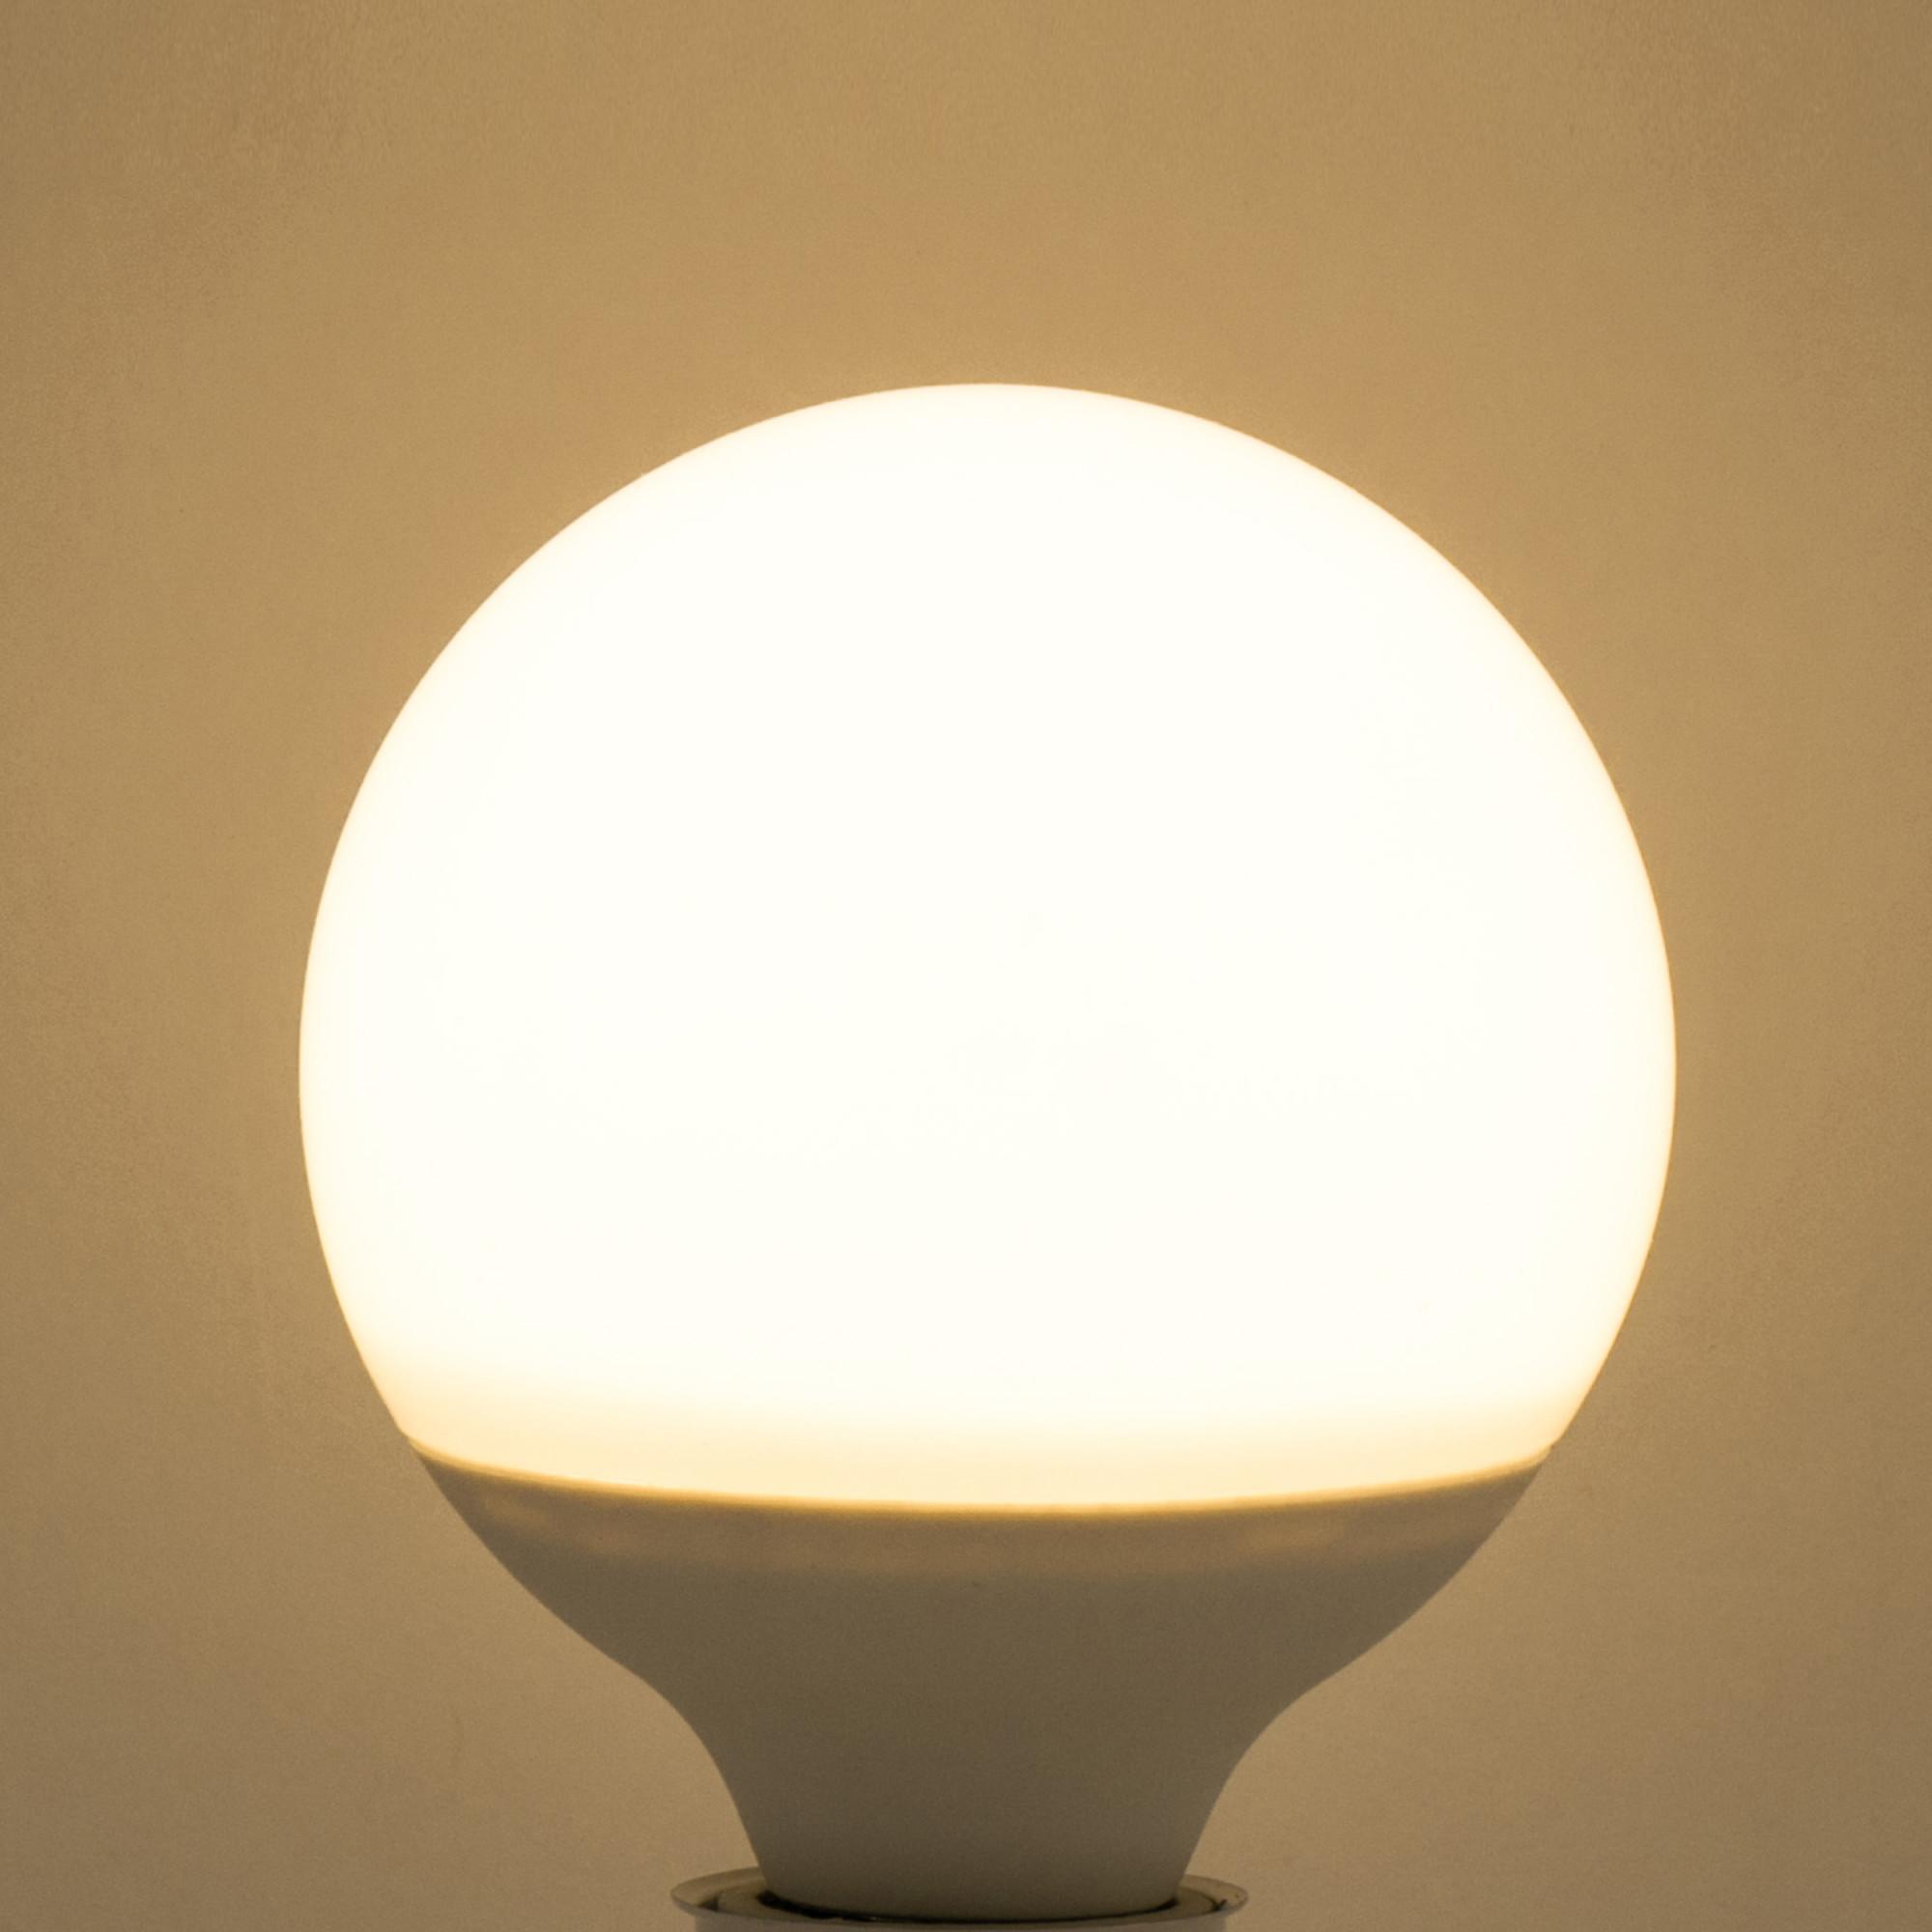 Лампа светодиодная Lexman E27 12 Вт 1100 Лм свет тёплый